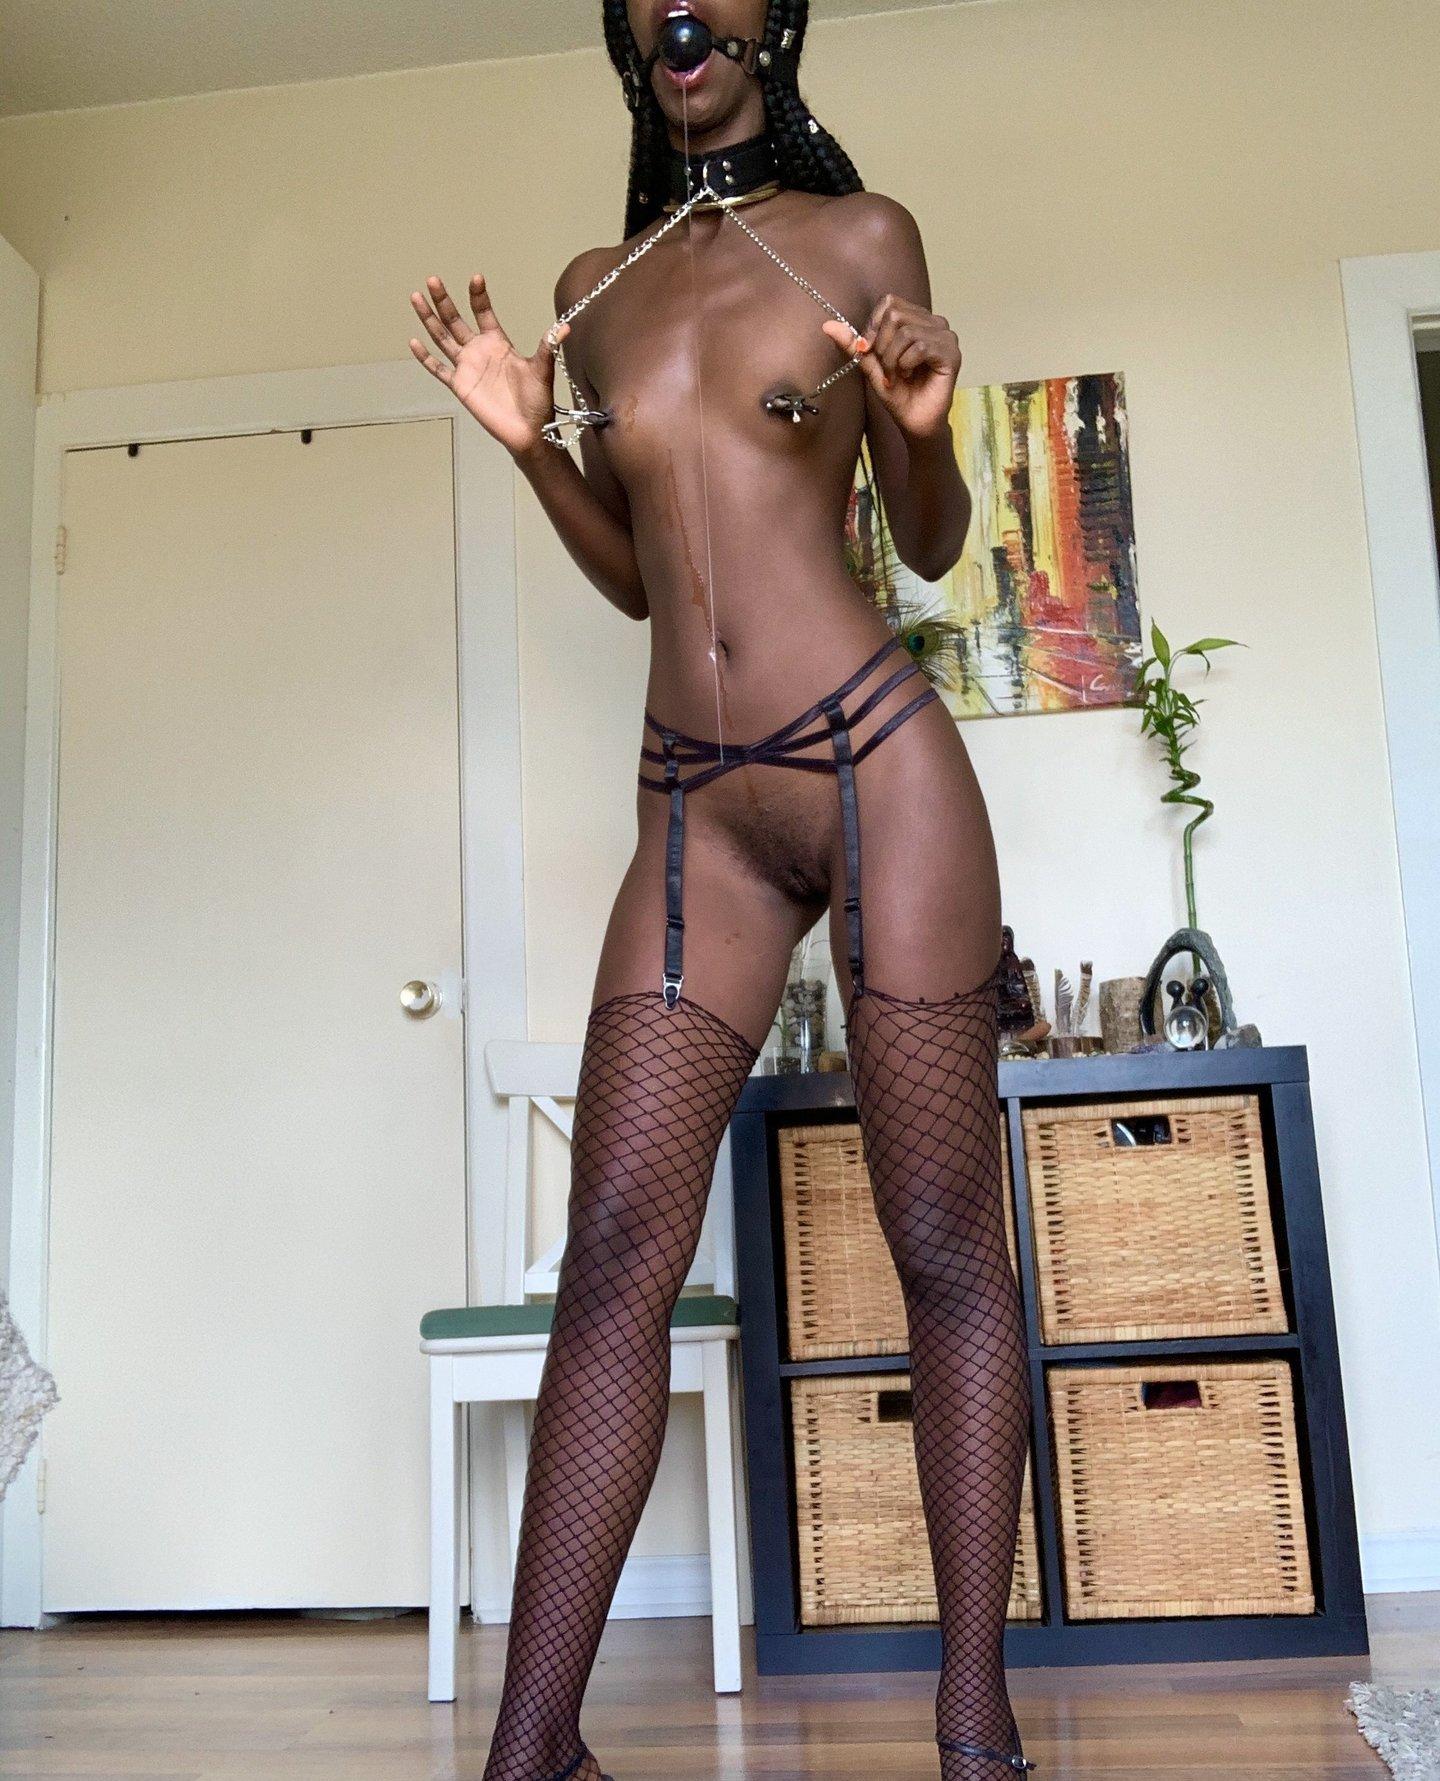 Sexmeat Sluttysexmeat Onlyfans Nude Leaks 0007